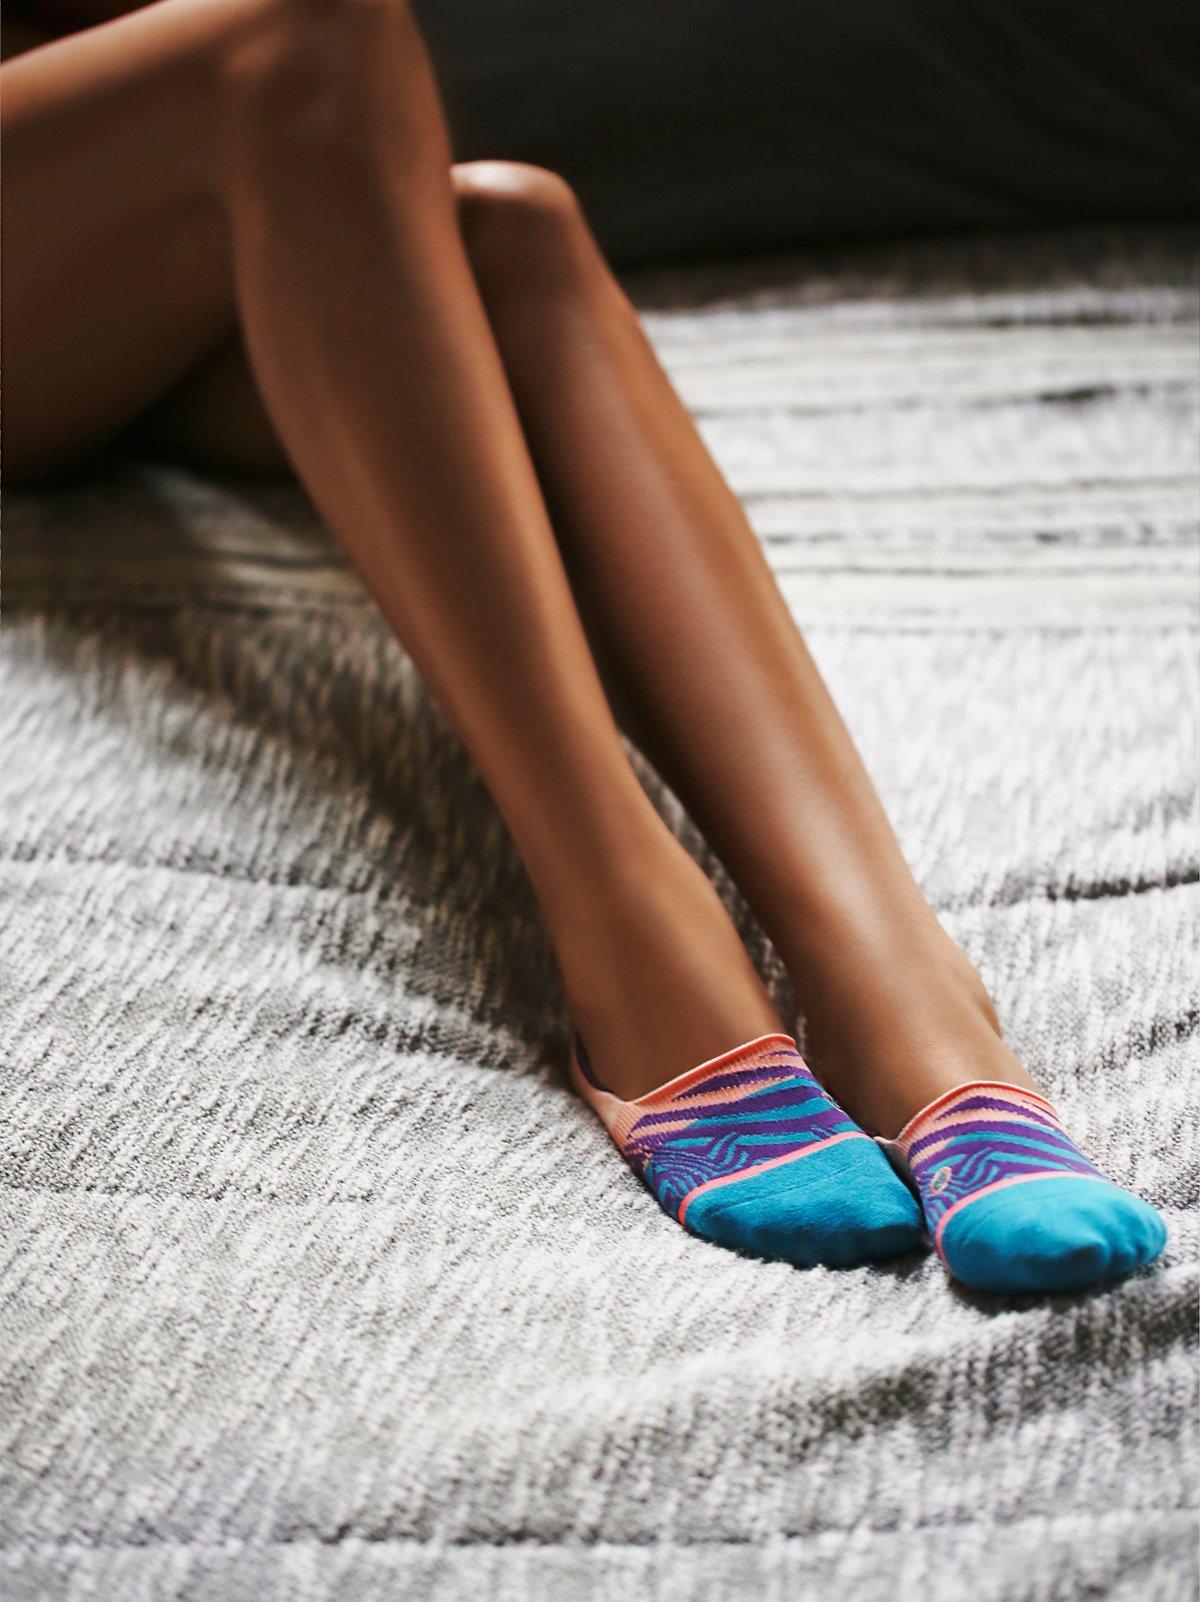 Bliss脚板袜